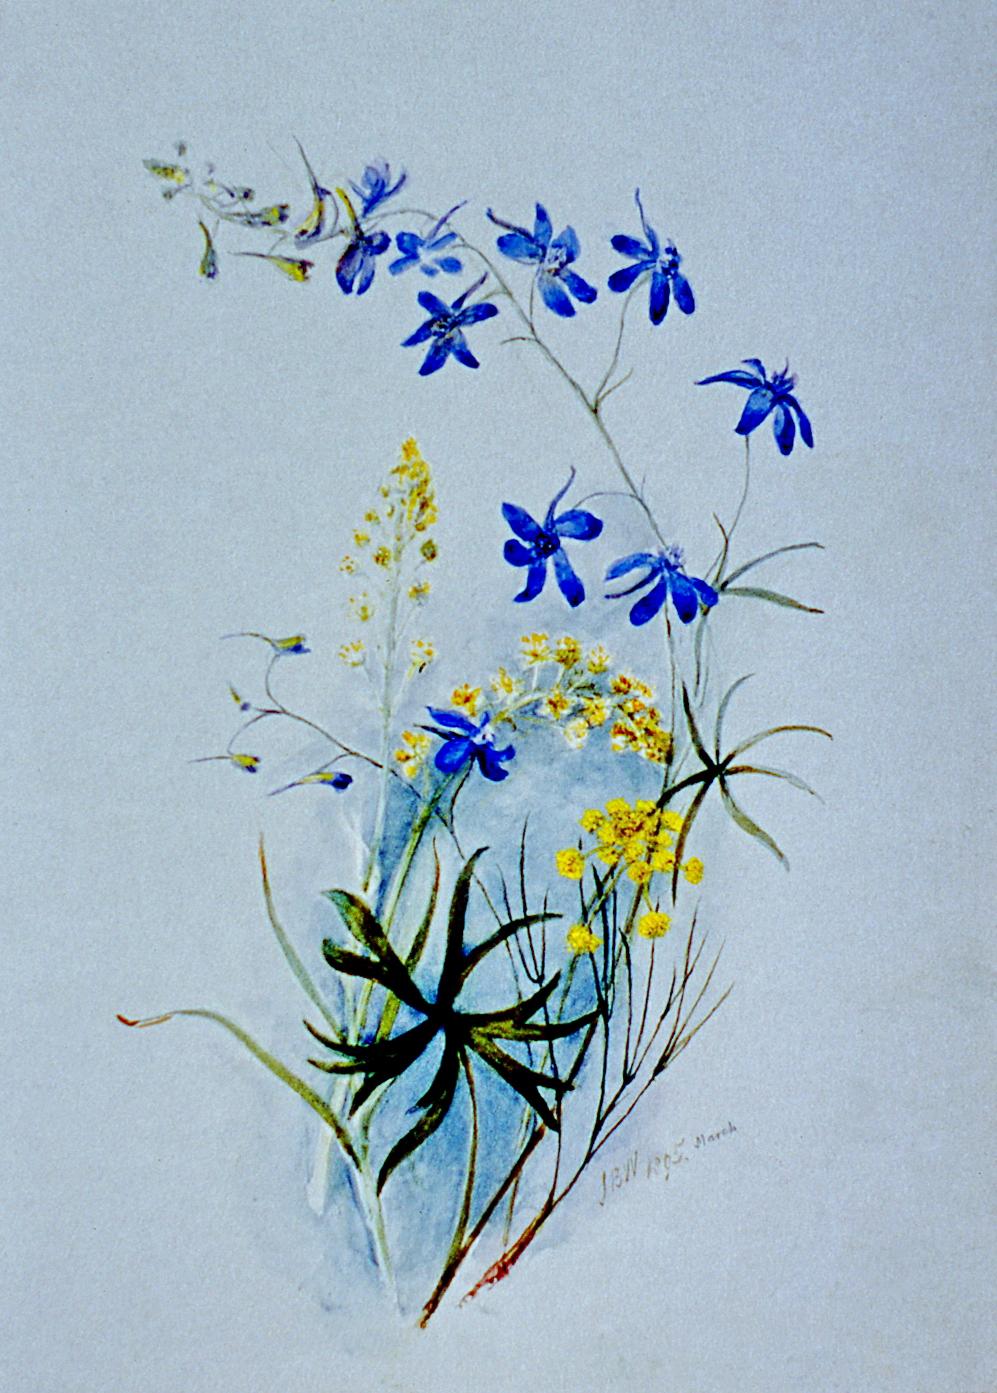 Wilfahinium variegatum Zyandeneus Venenasus , March 1895,Julia Bullock Webster, watercolour on paper, 35.5 cm x 25.4 cm, 2003.02.30, gift of The Grist Mill at Keremeos